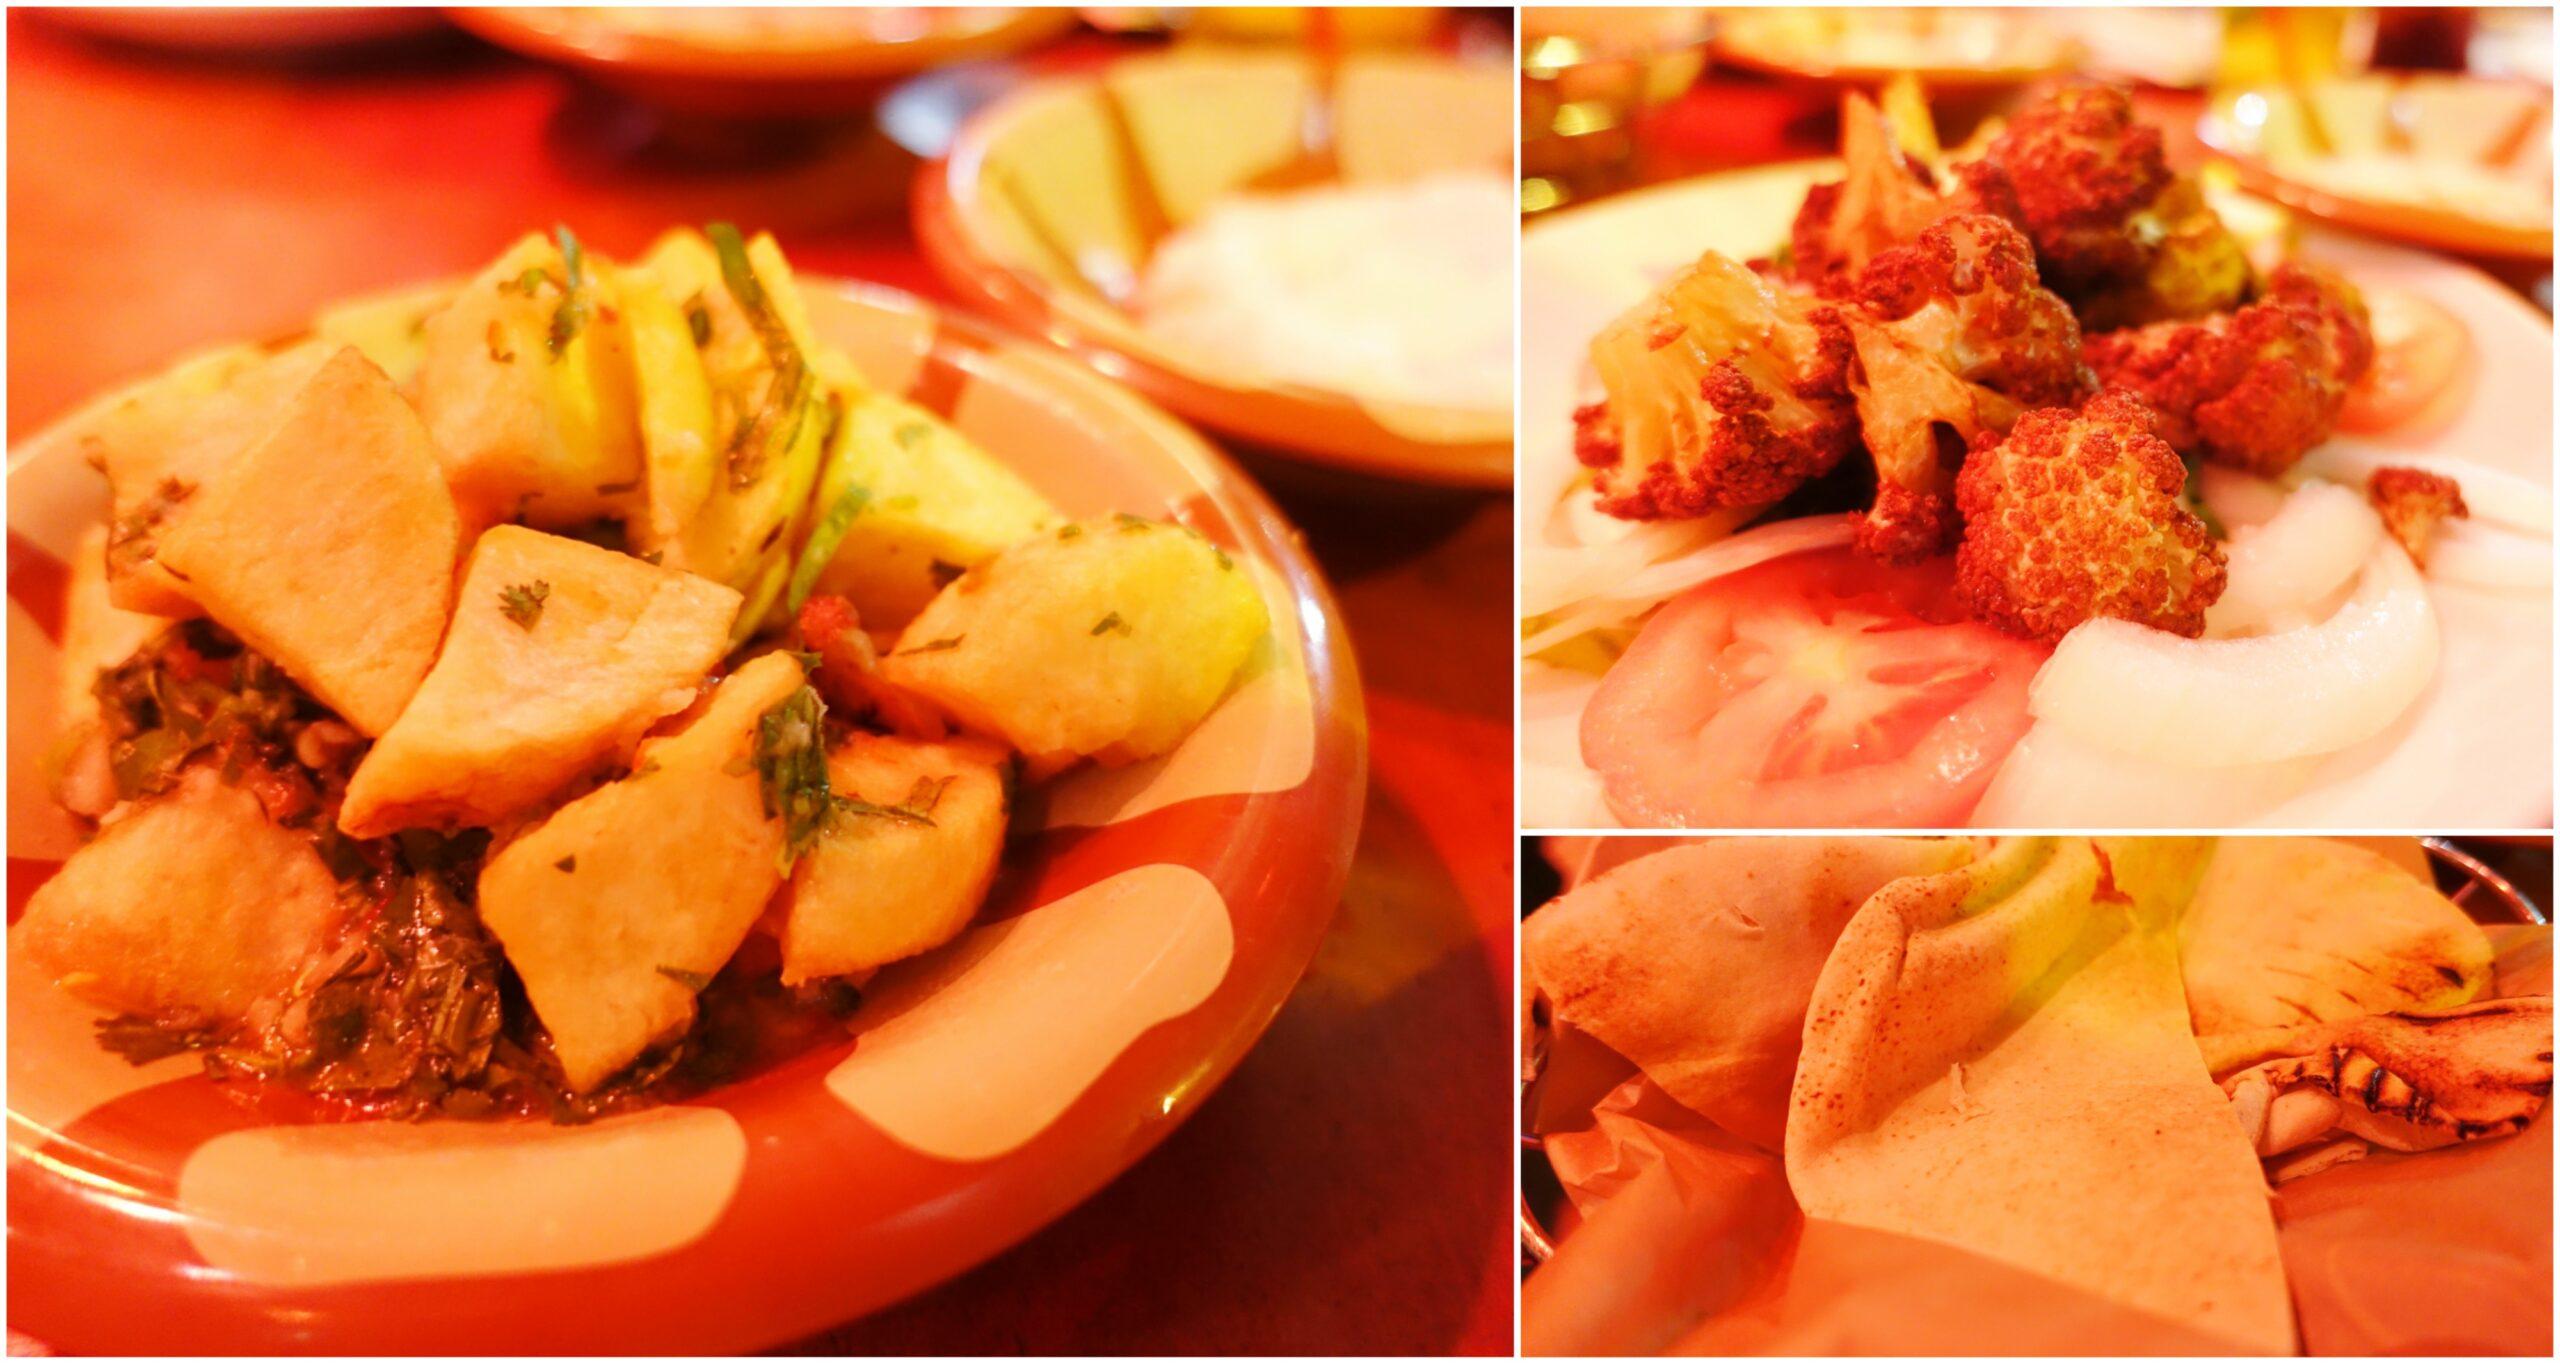 Fried Potatoes, Fried Cauliflower, Pita - Open Sesame, Long Beach, California